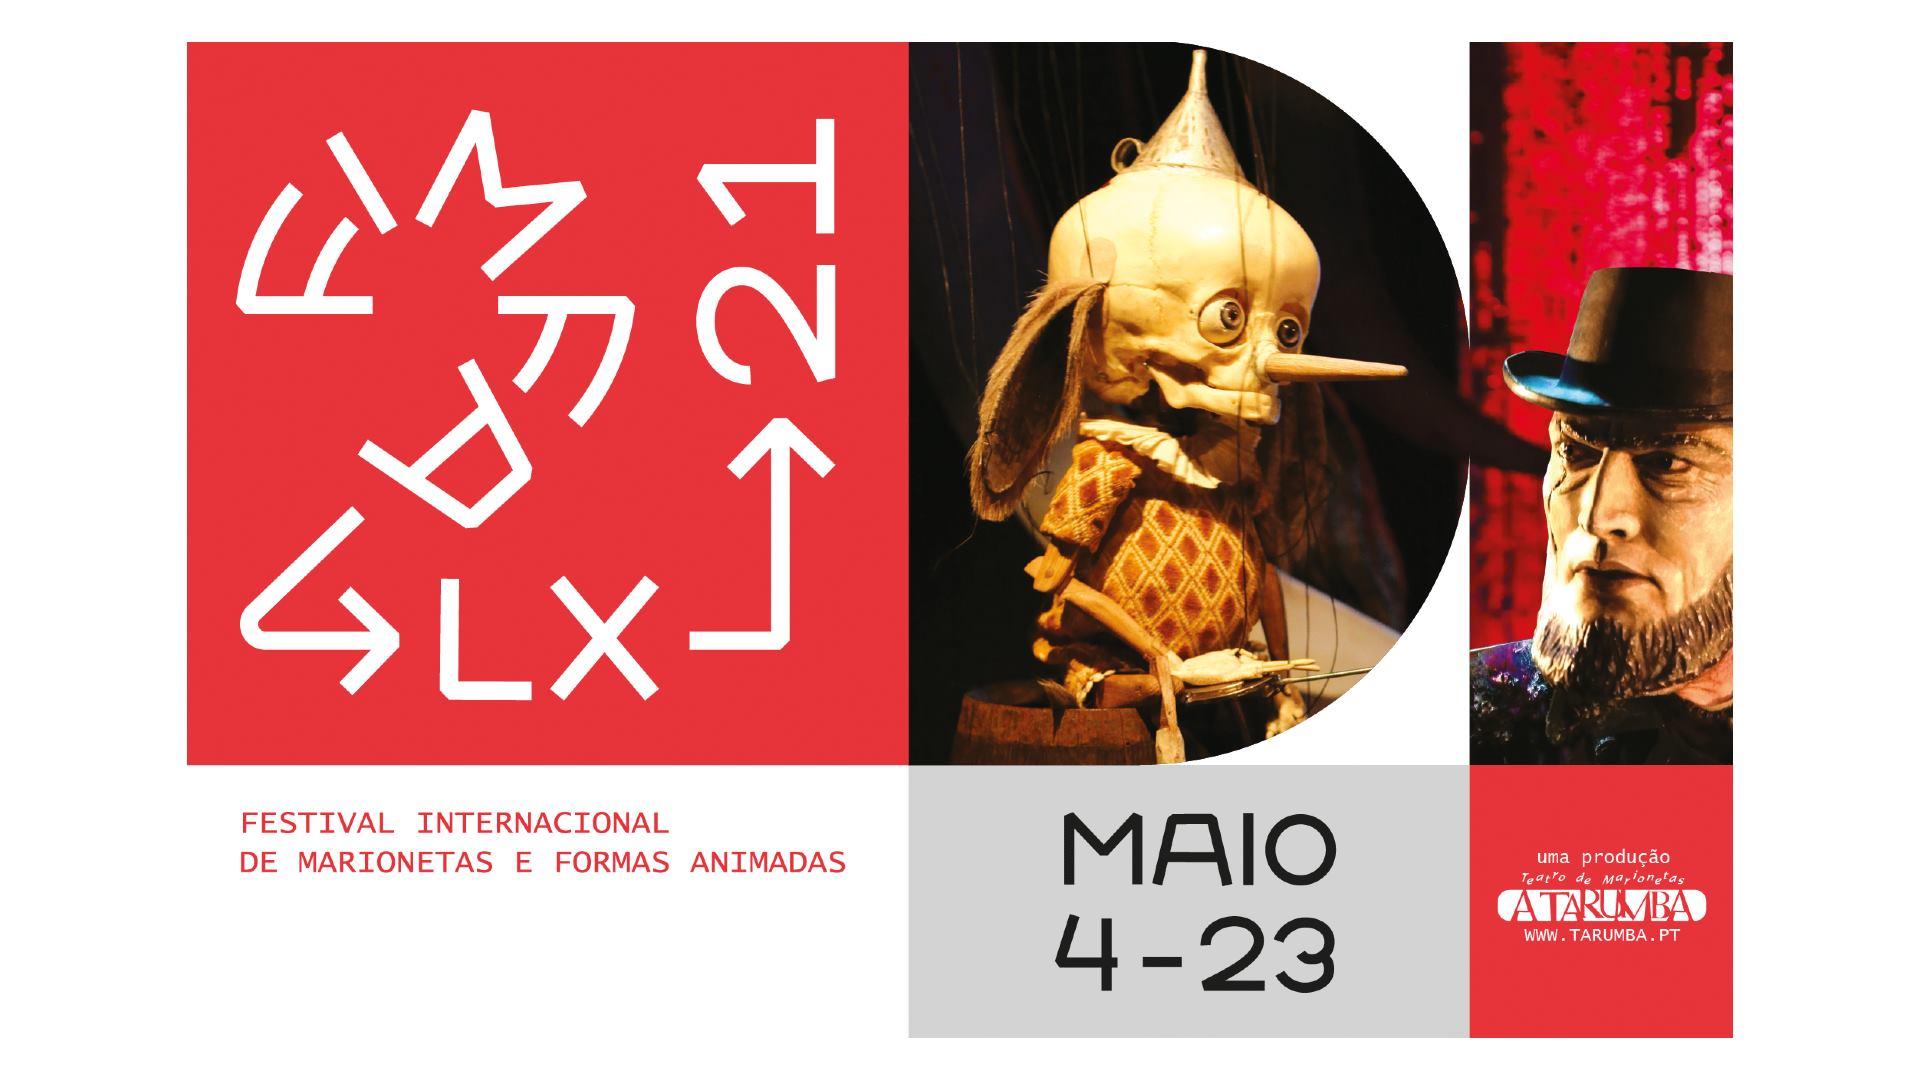 FIMFA Lx21 - Festival Internacional de Marionetas e Formas Animadas